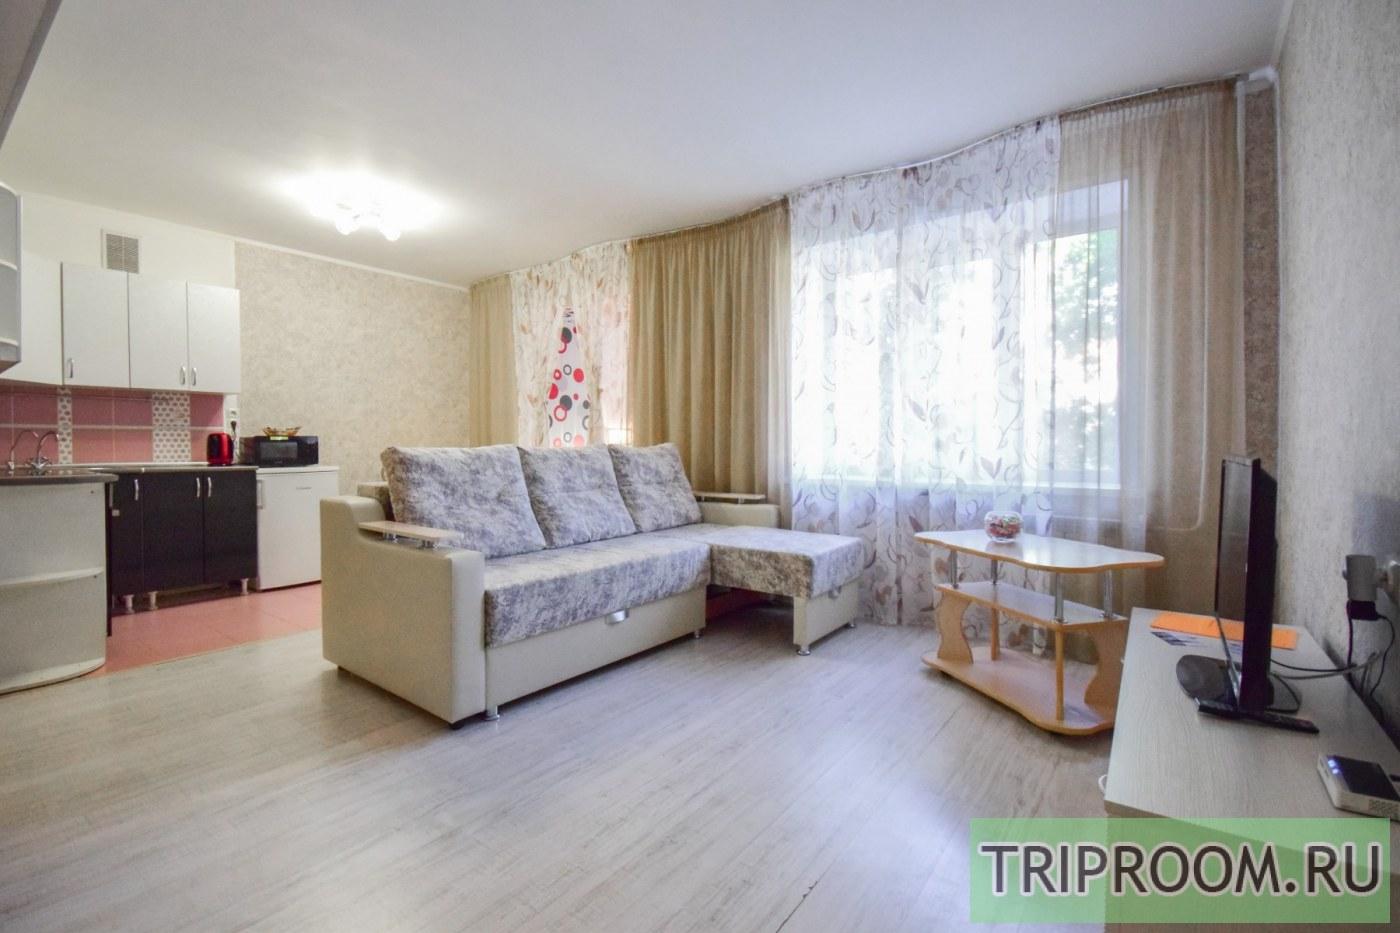 1-комнатная квартира посуточно (вариант № 36547), ул. Тихий переулок, фото № 5